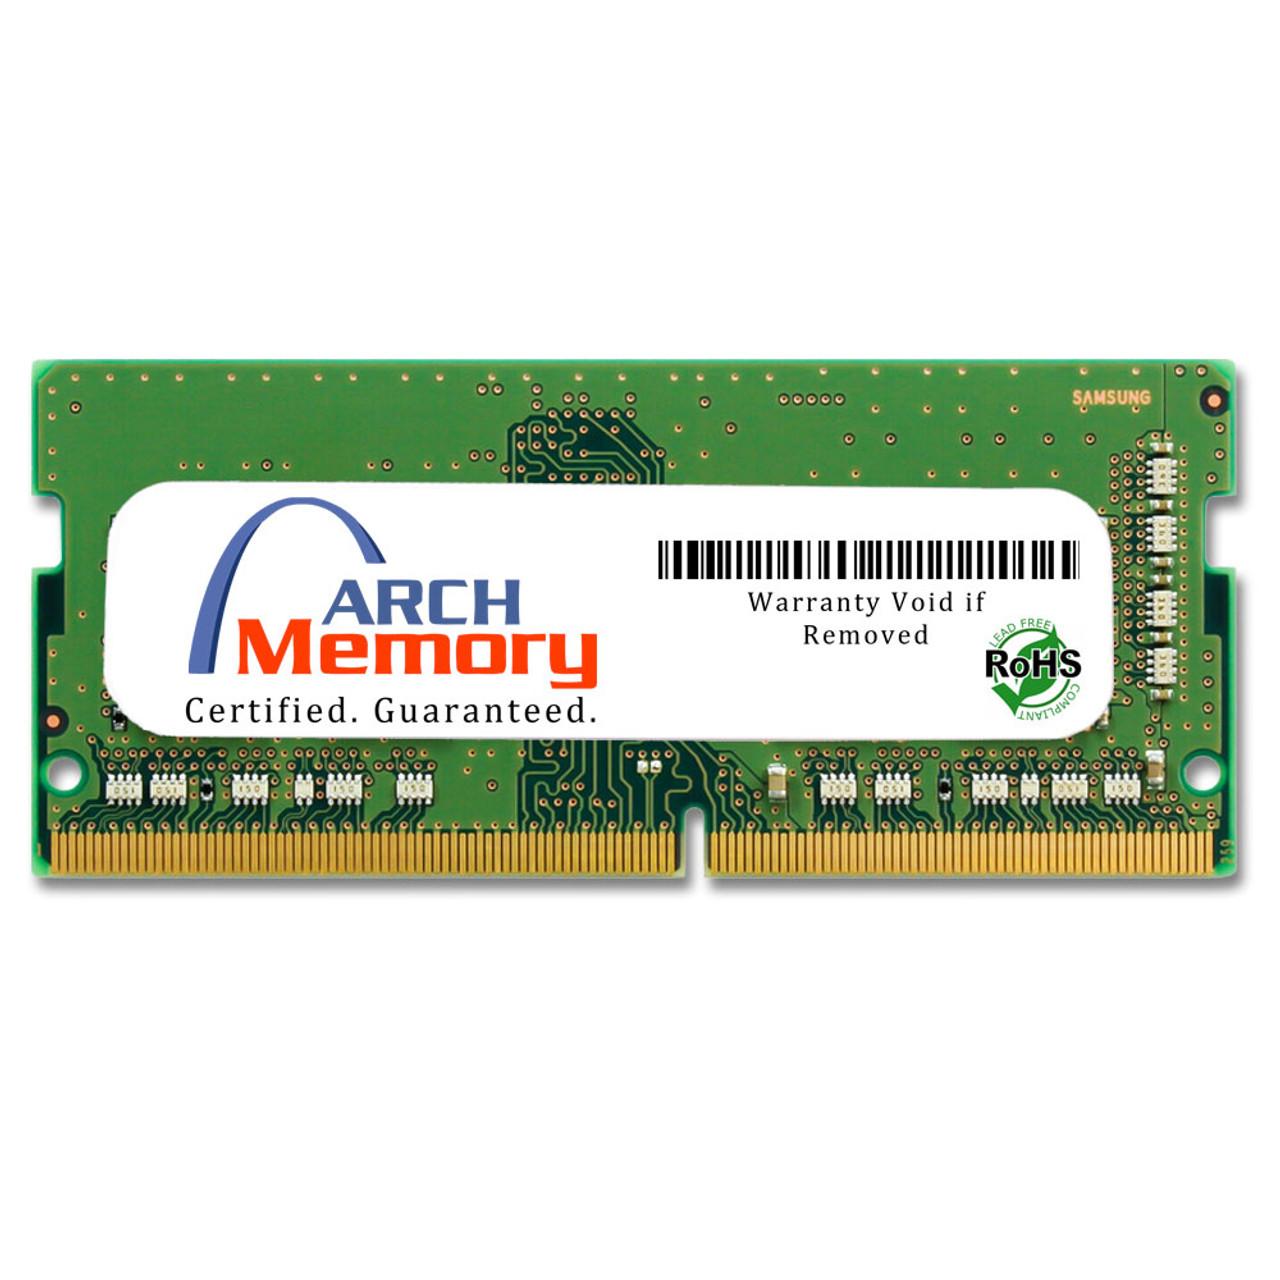 8GB 260-Pin DDR4-3200 PC4-25600 Sodimm (1Rx8) RAM | Arch Memory